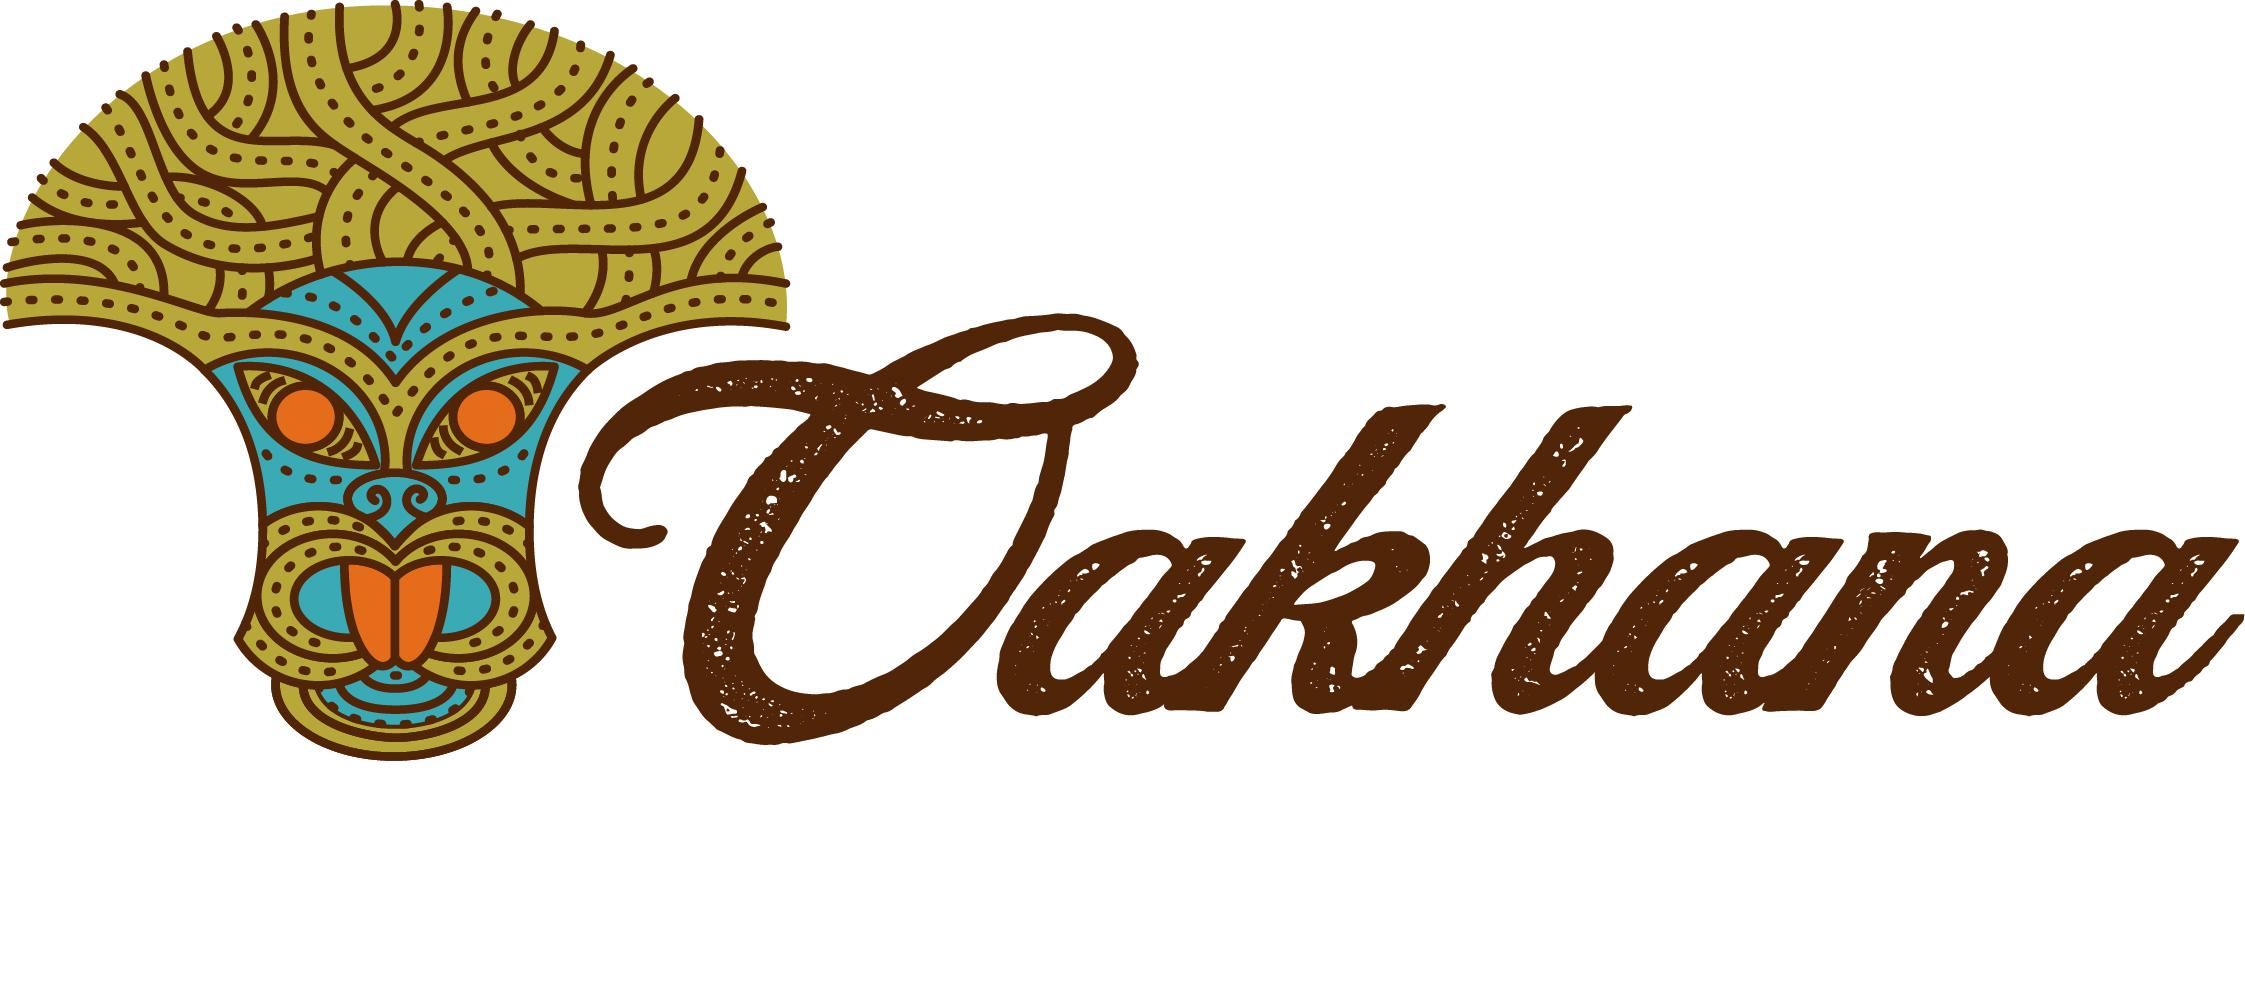 OaklandTiki.com